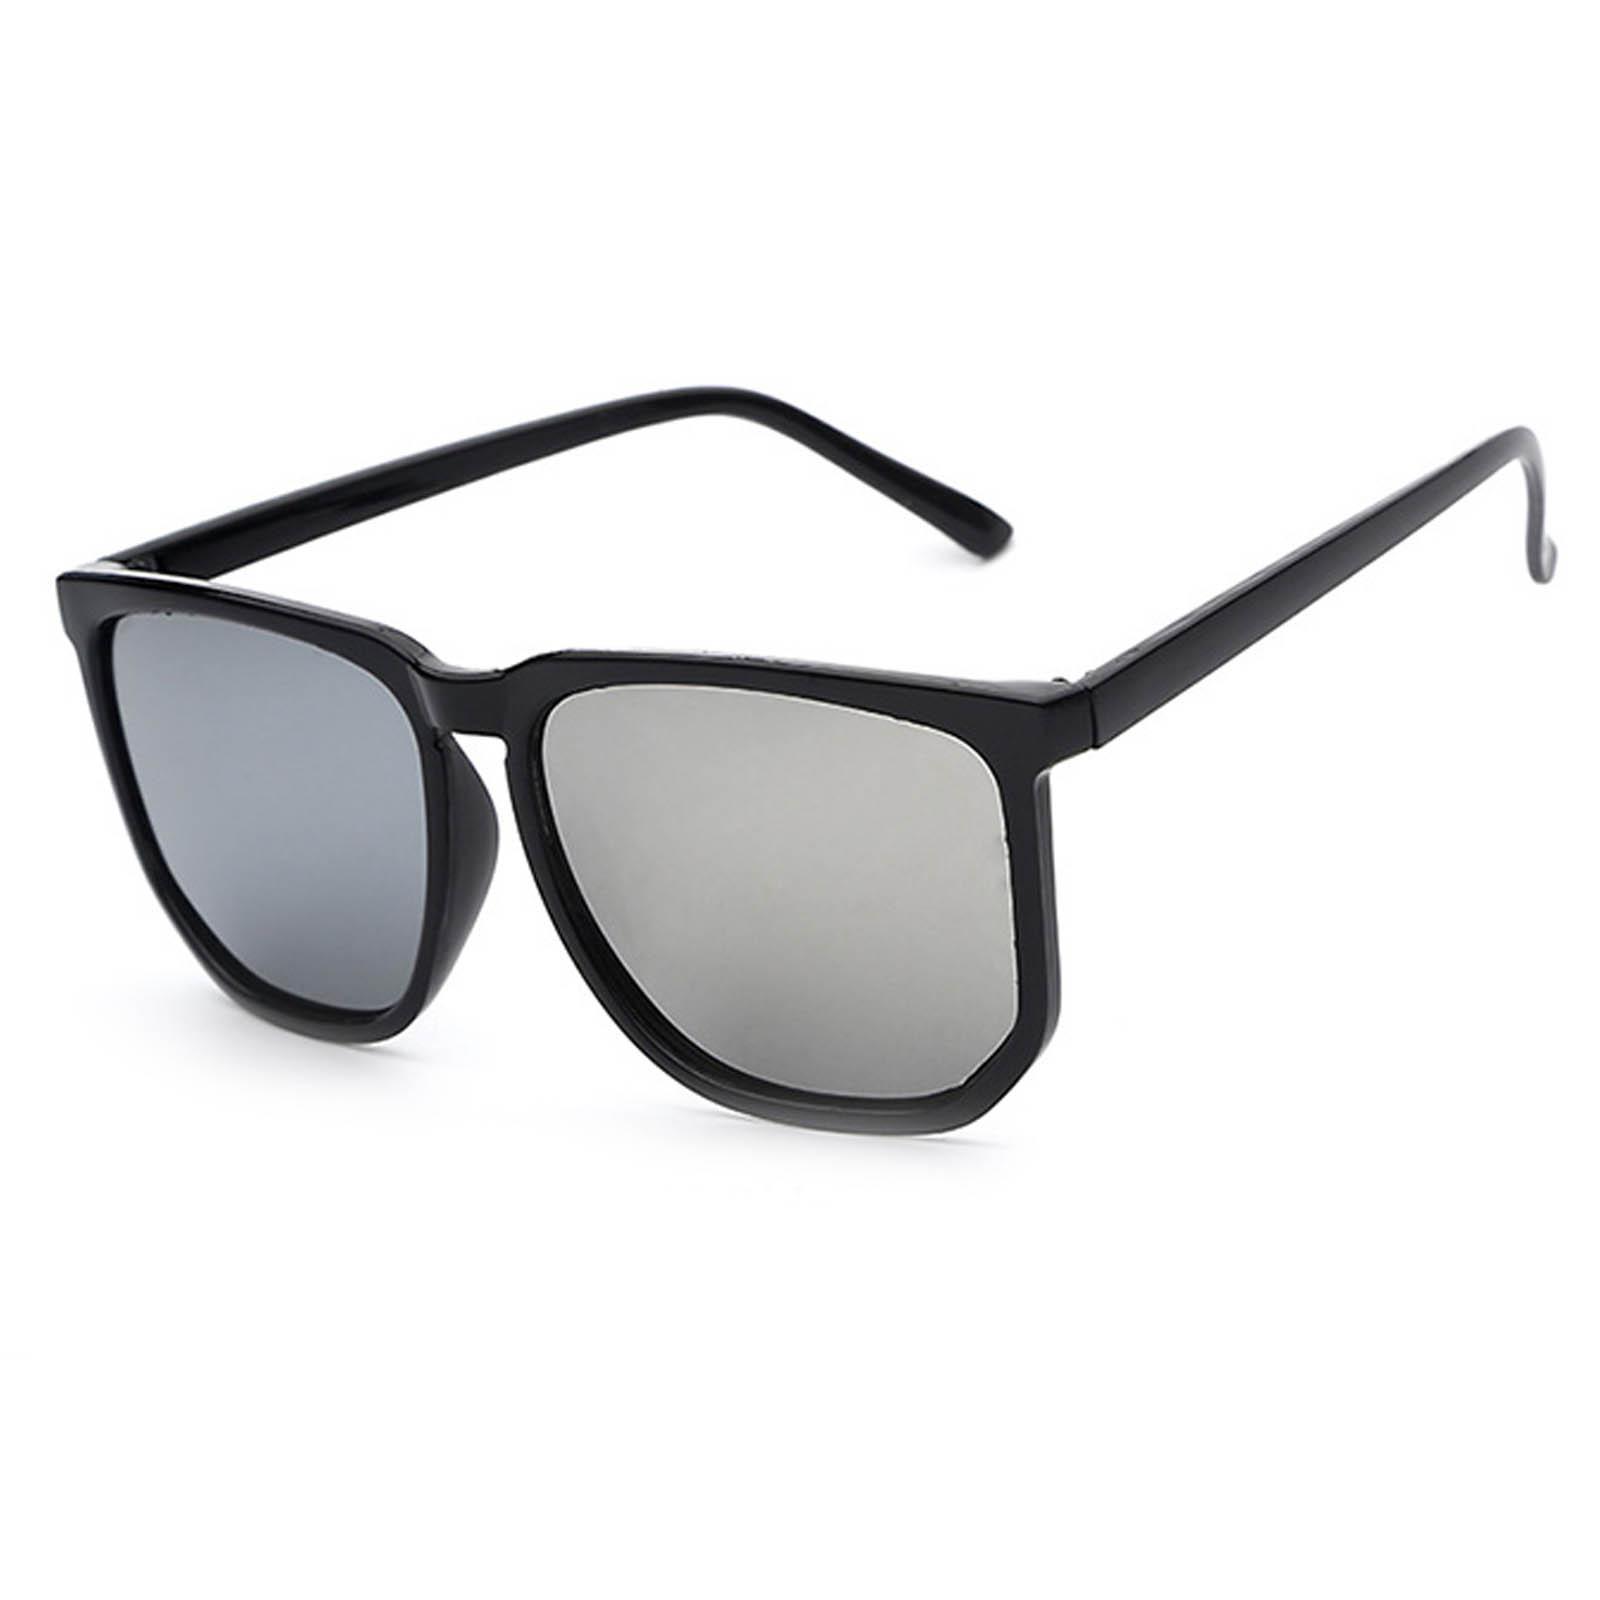 OWL ® 046 C4 Rectangle Eyewear Sunglasses Women's Men's Metal Black Frame Silver Lens One Pair